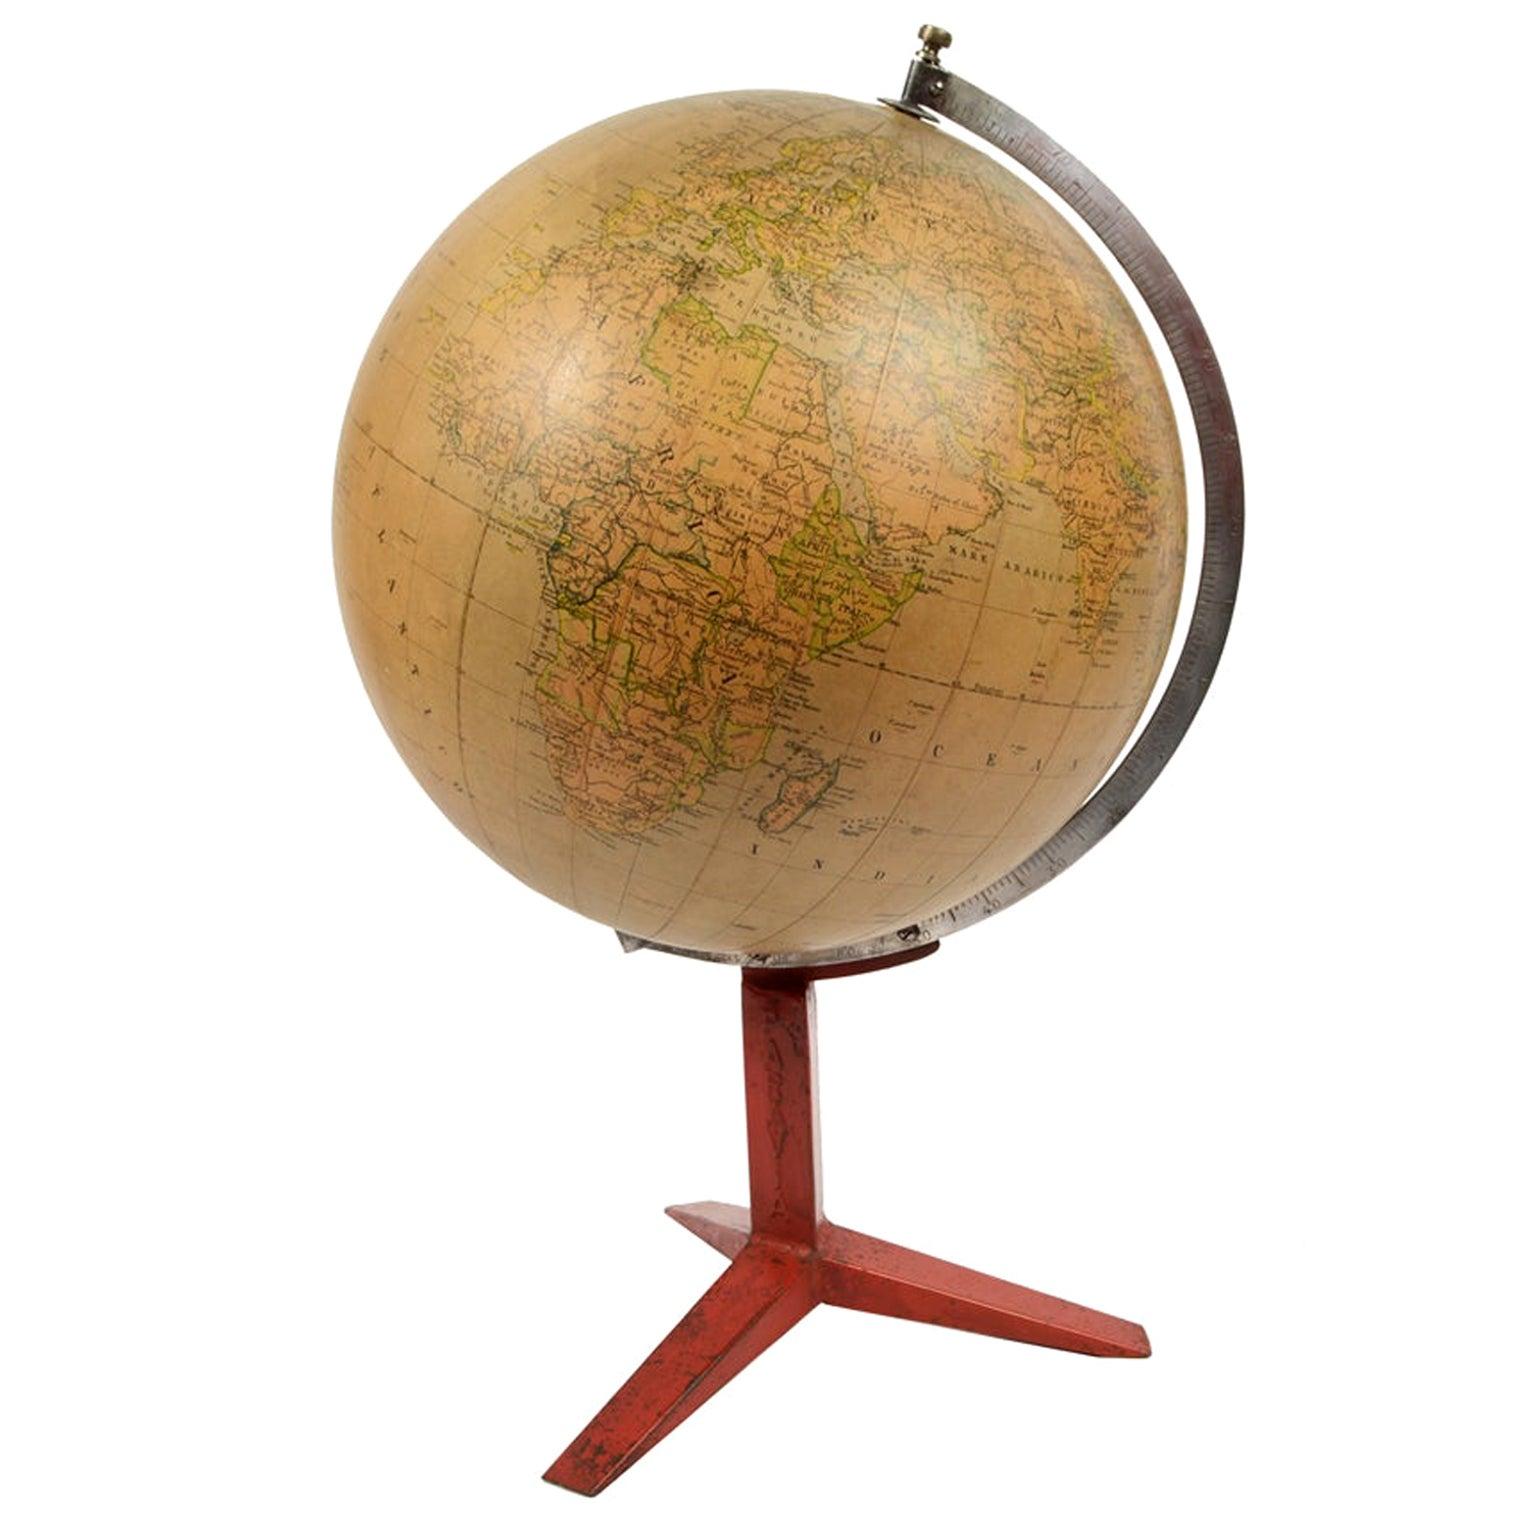 Italian Globe with Metal Base, 1940s-1950s